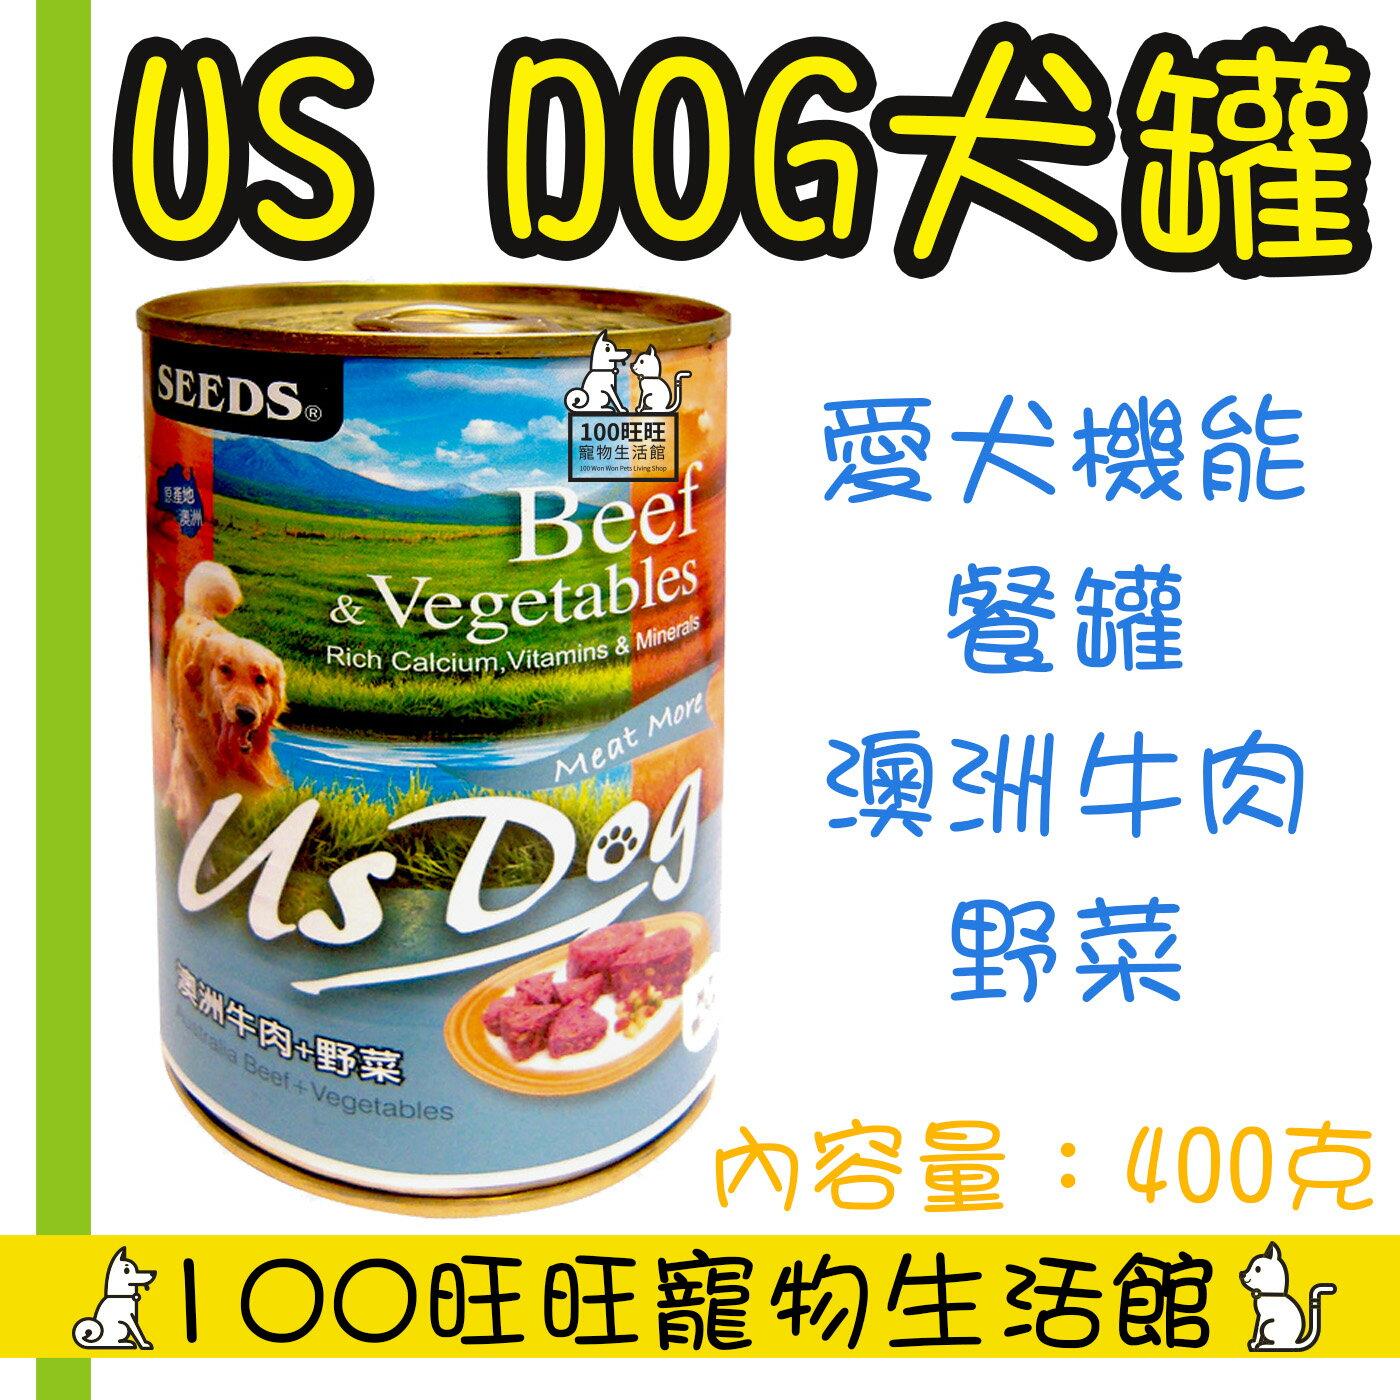 SEEDS 惜時 聖萊西 US DOG愛犬機能餐罐 單罐